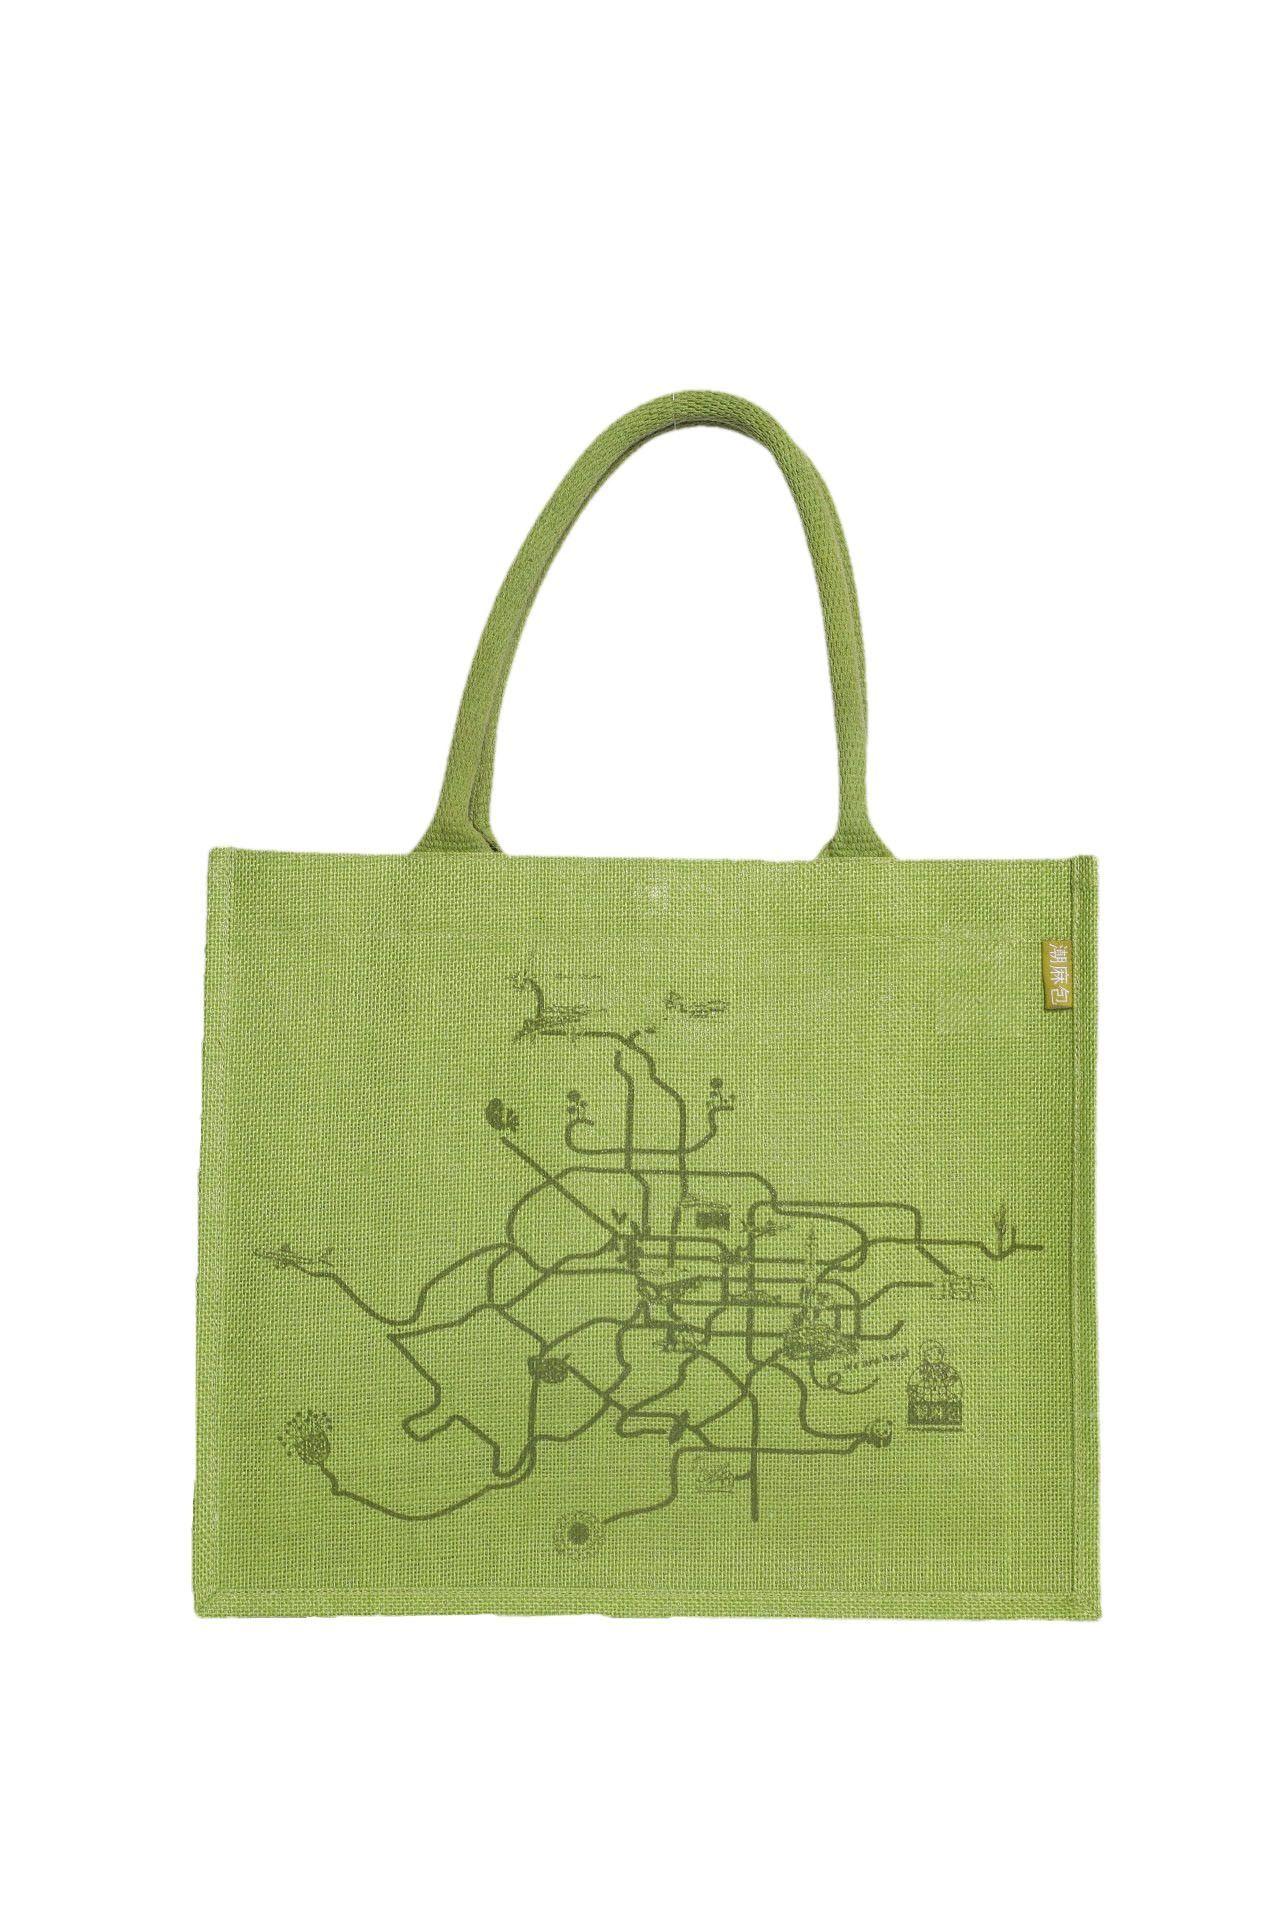 Eco-Friendly Jute Tote Bag Set, Green: KK Jute Bag Green Tote with ...